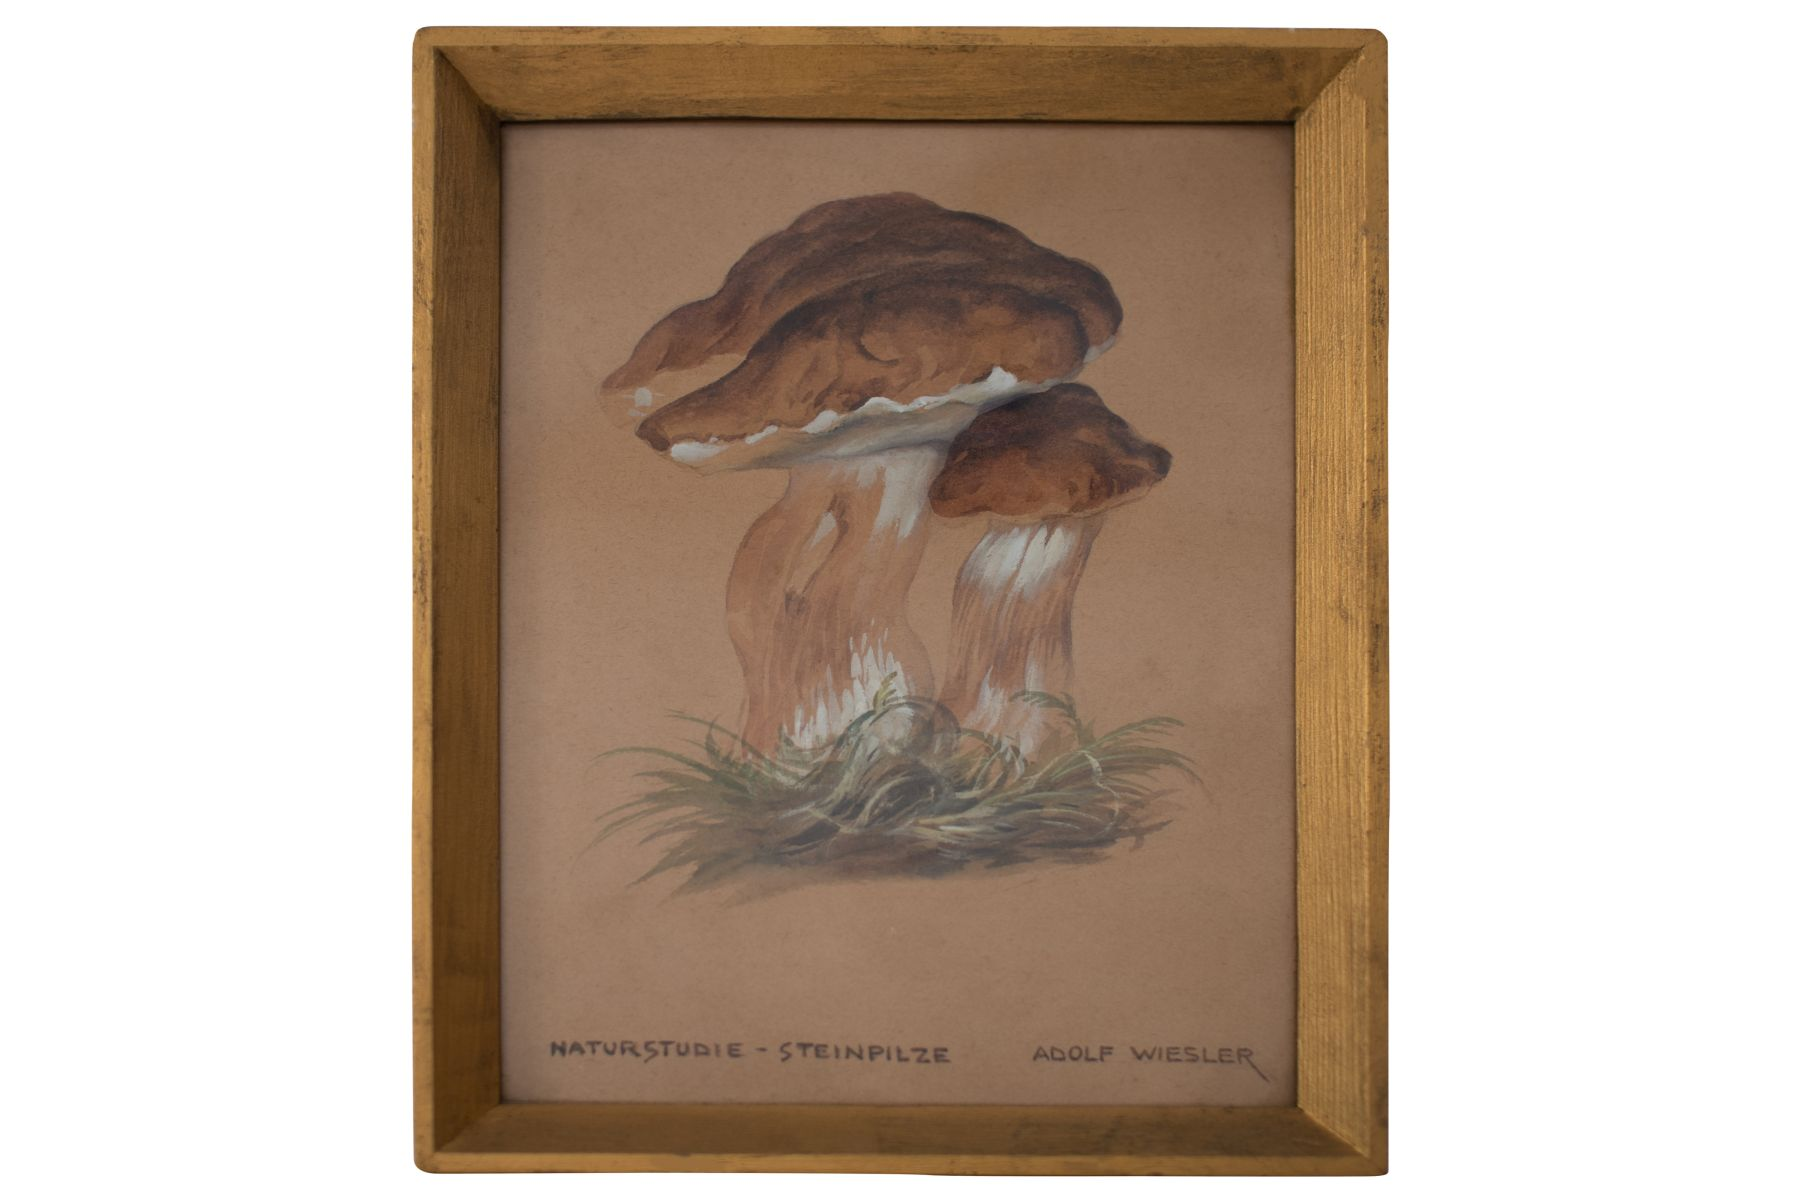 "#93 Porcini mushrooms | Adolf Wiesler(1878-1958) ""Steinpilze"" Image"